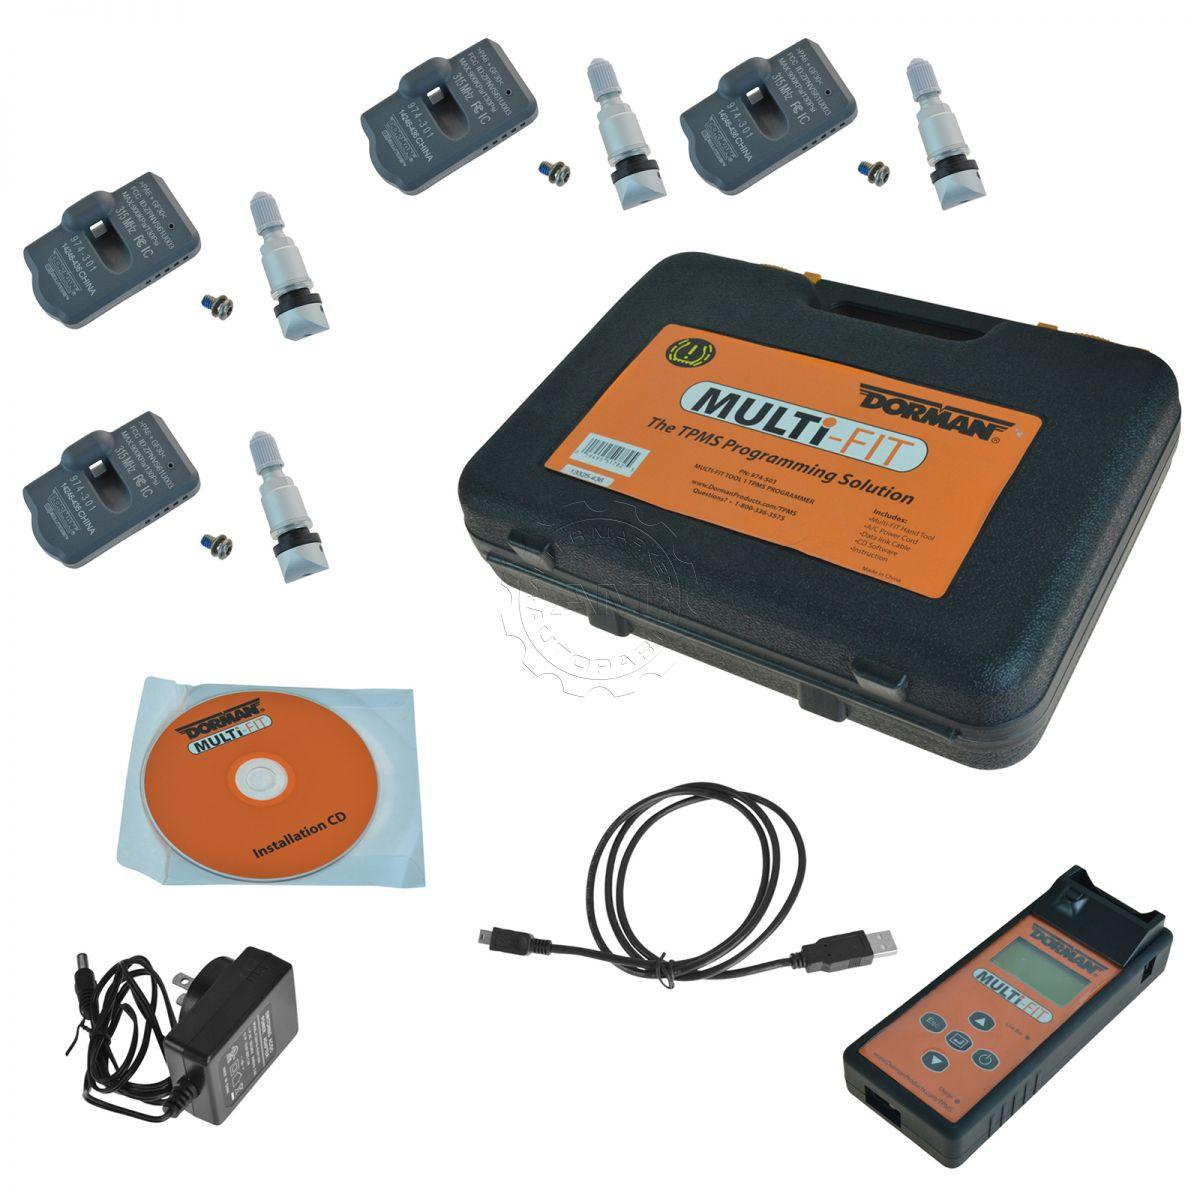 Dorman Tire Pressure Monitor Sensor Set & Programming Tool New | eBay